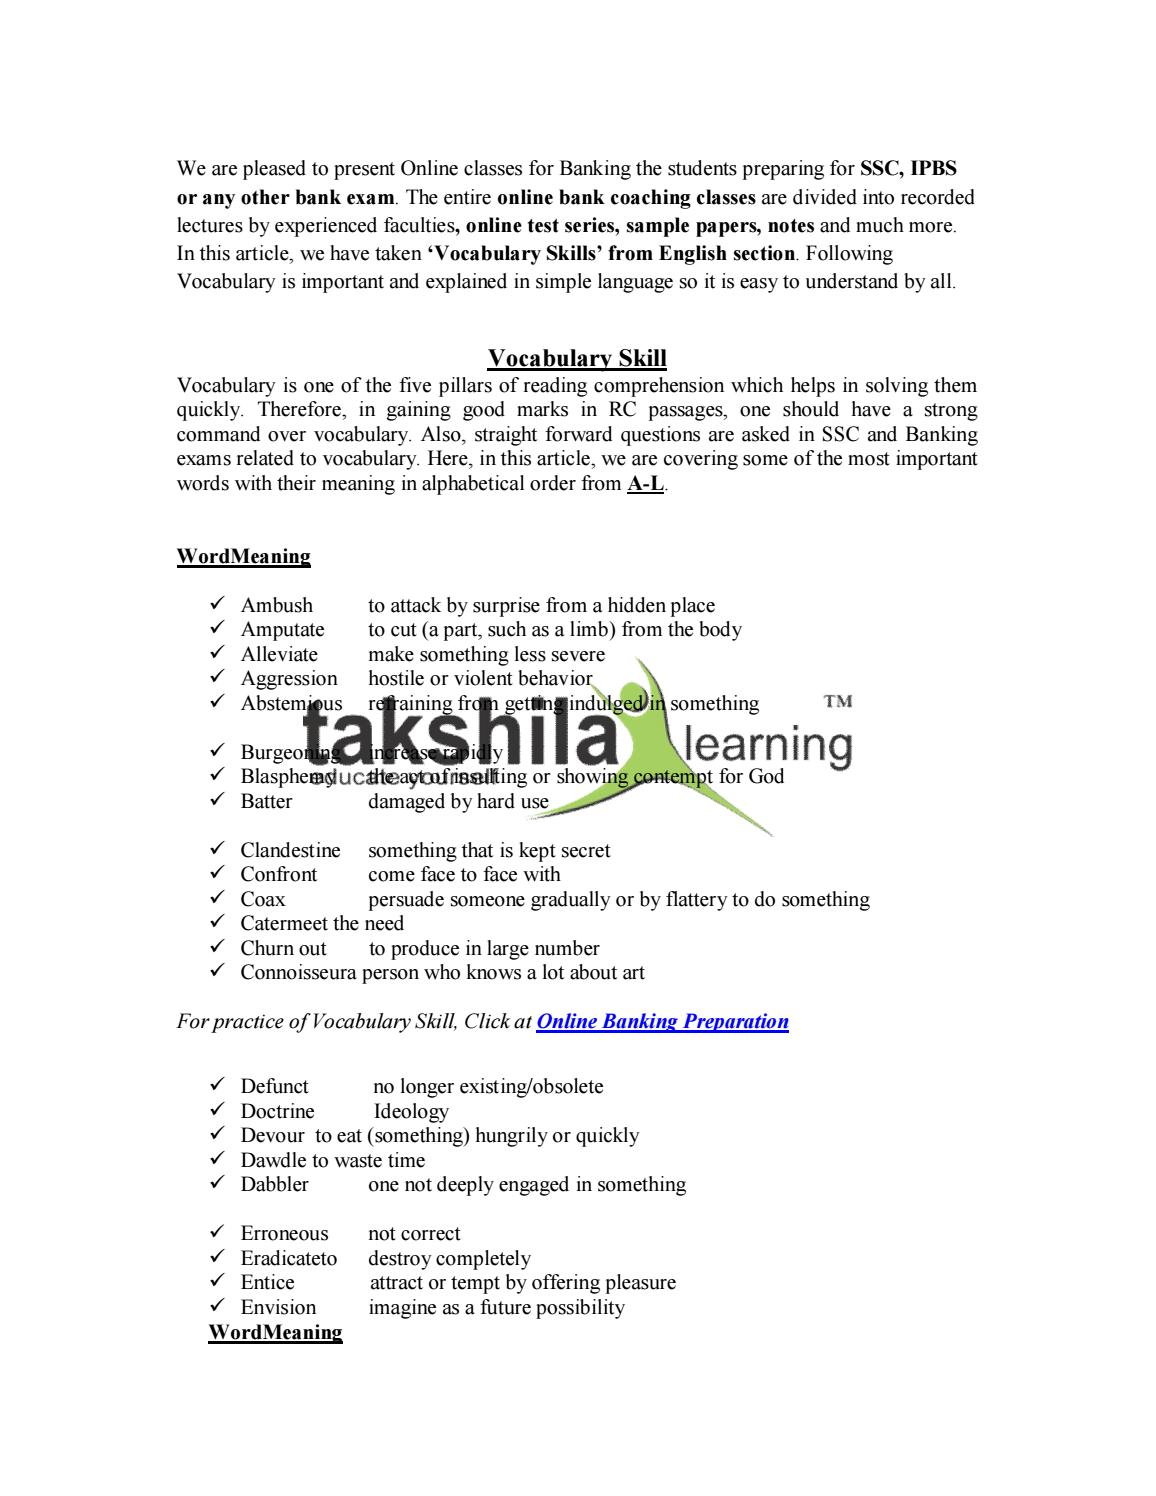 Bank Po Clerk Exam Vocabulary Skills Preparation Vocabulary For Bank Exams By Takshila Learning Issuu